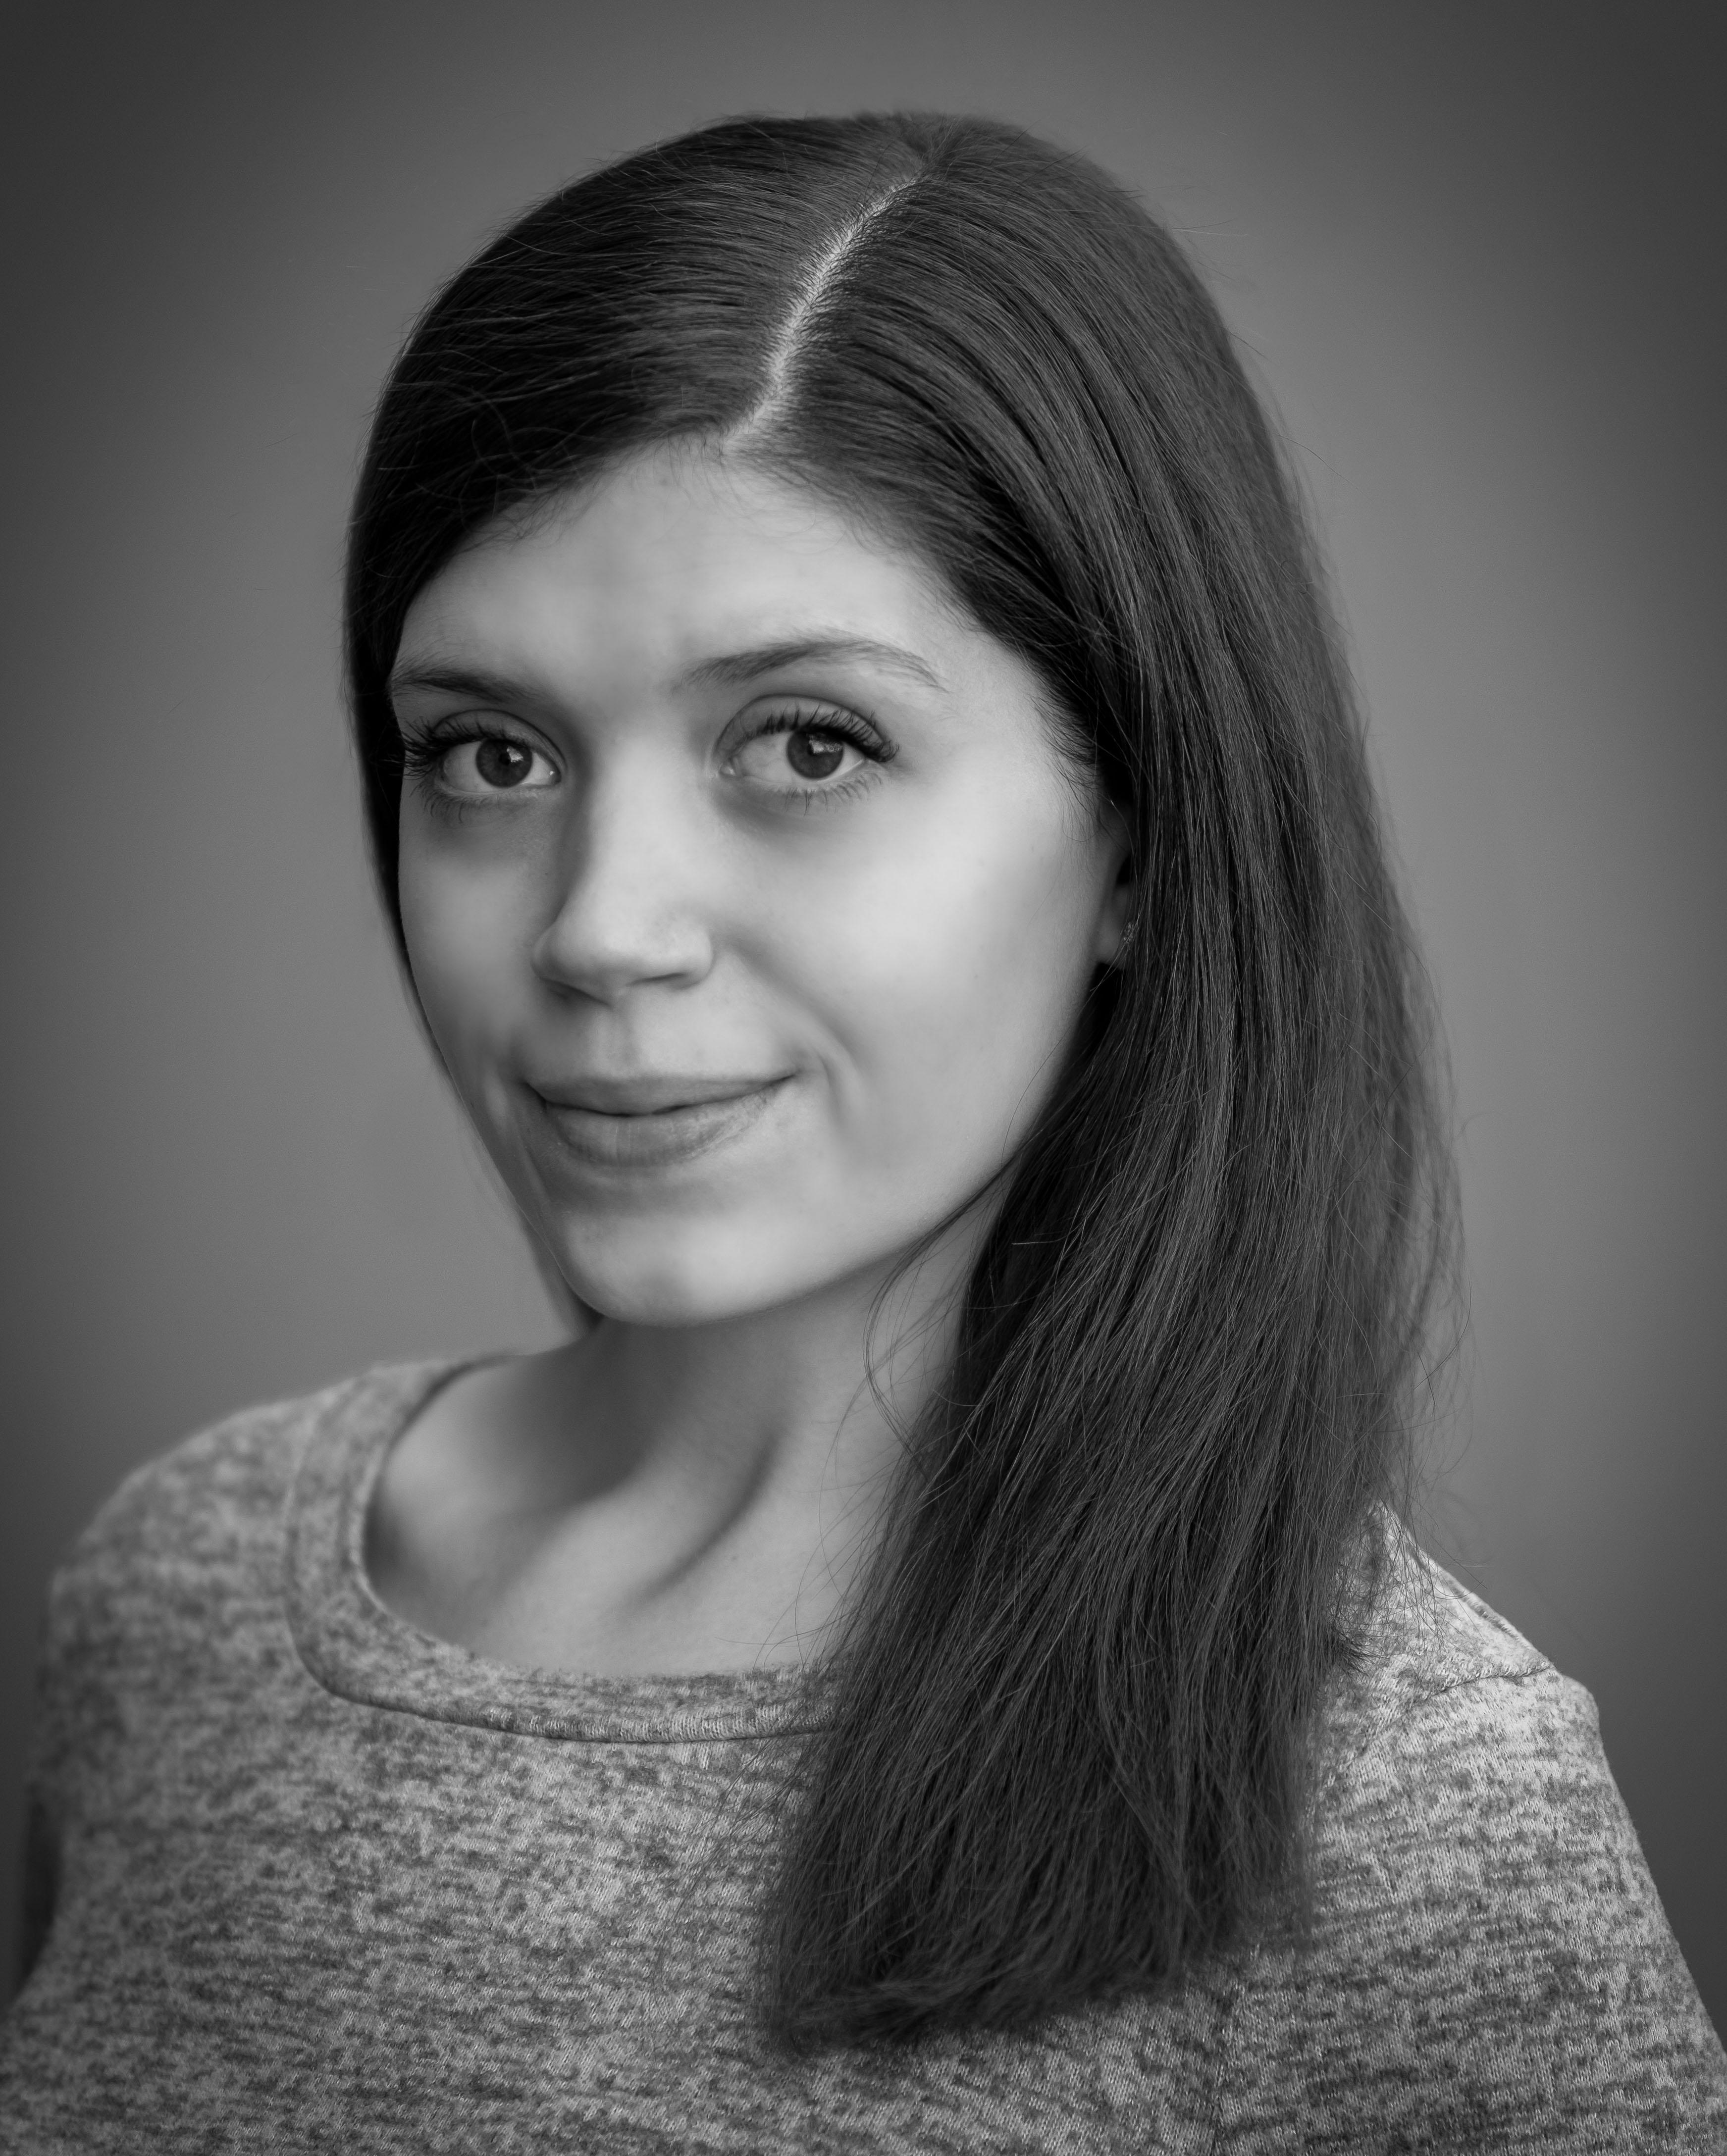 Nora Fancsalszky headshotBW(1)